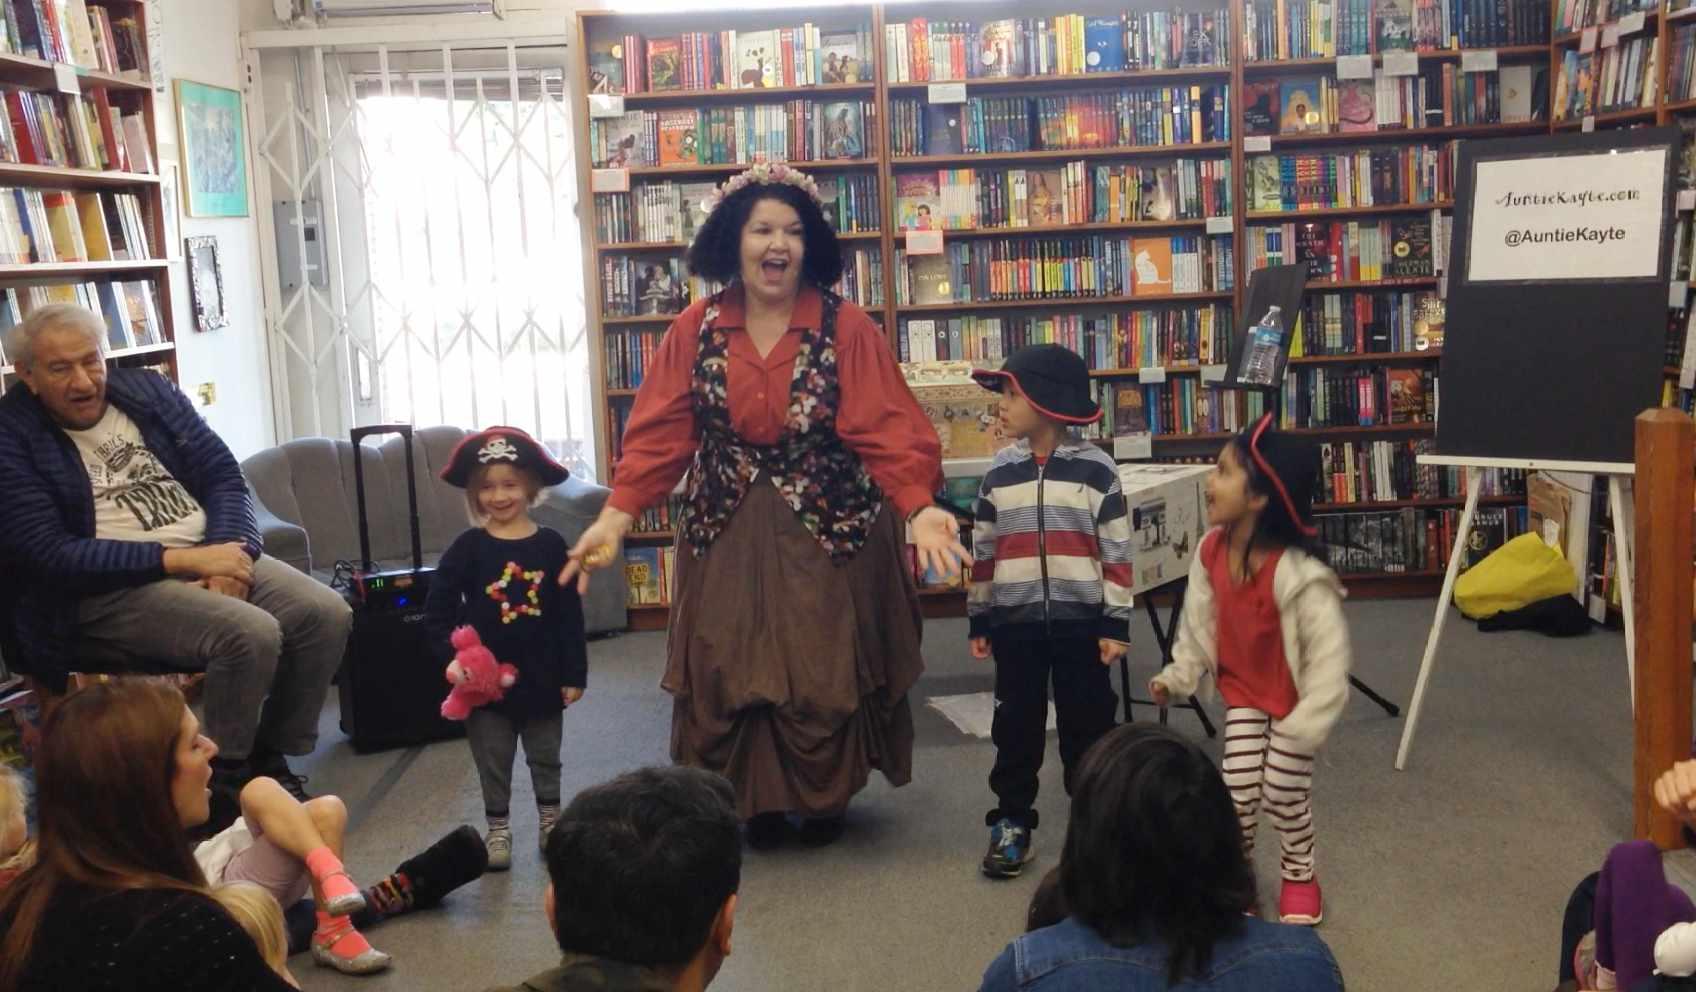 Auntie Kayte performing at Children's Book World